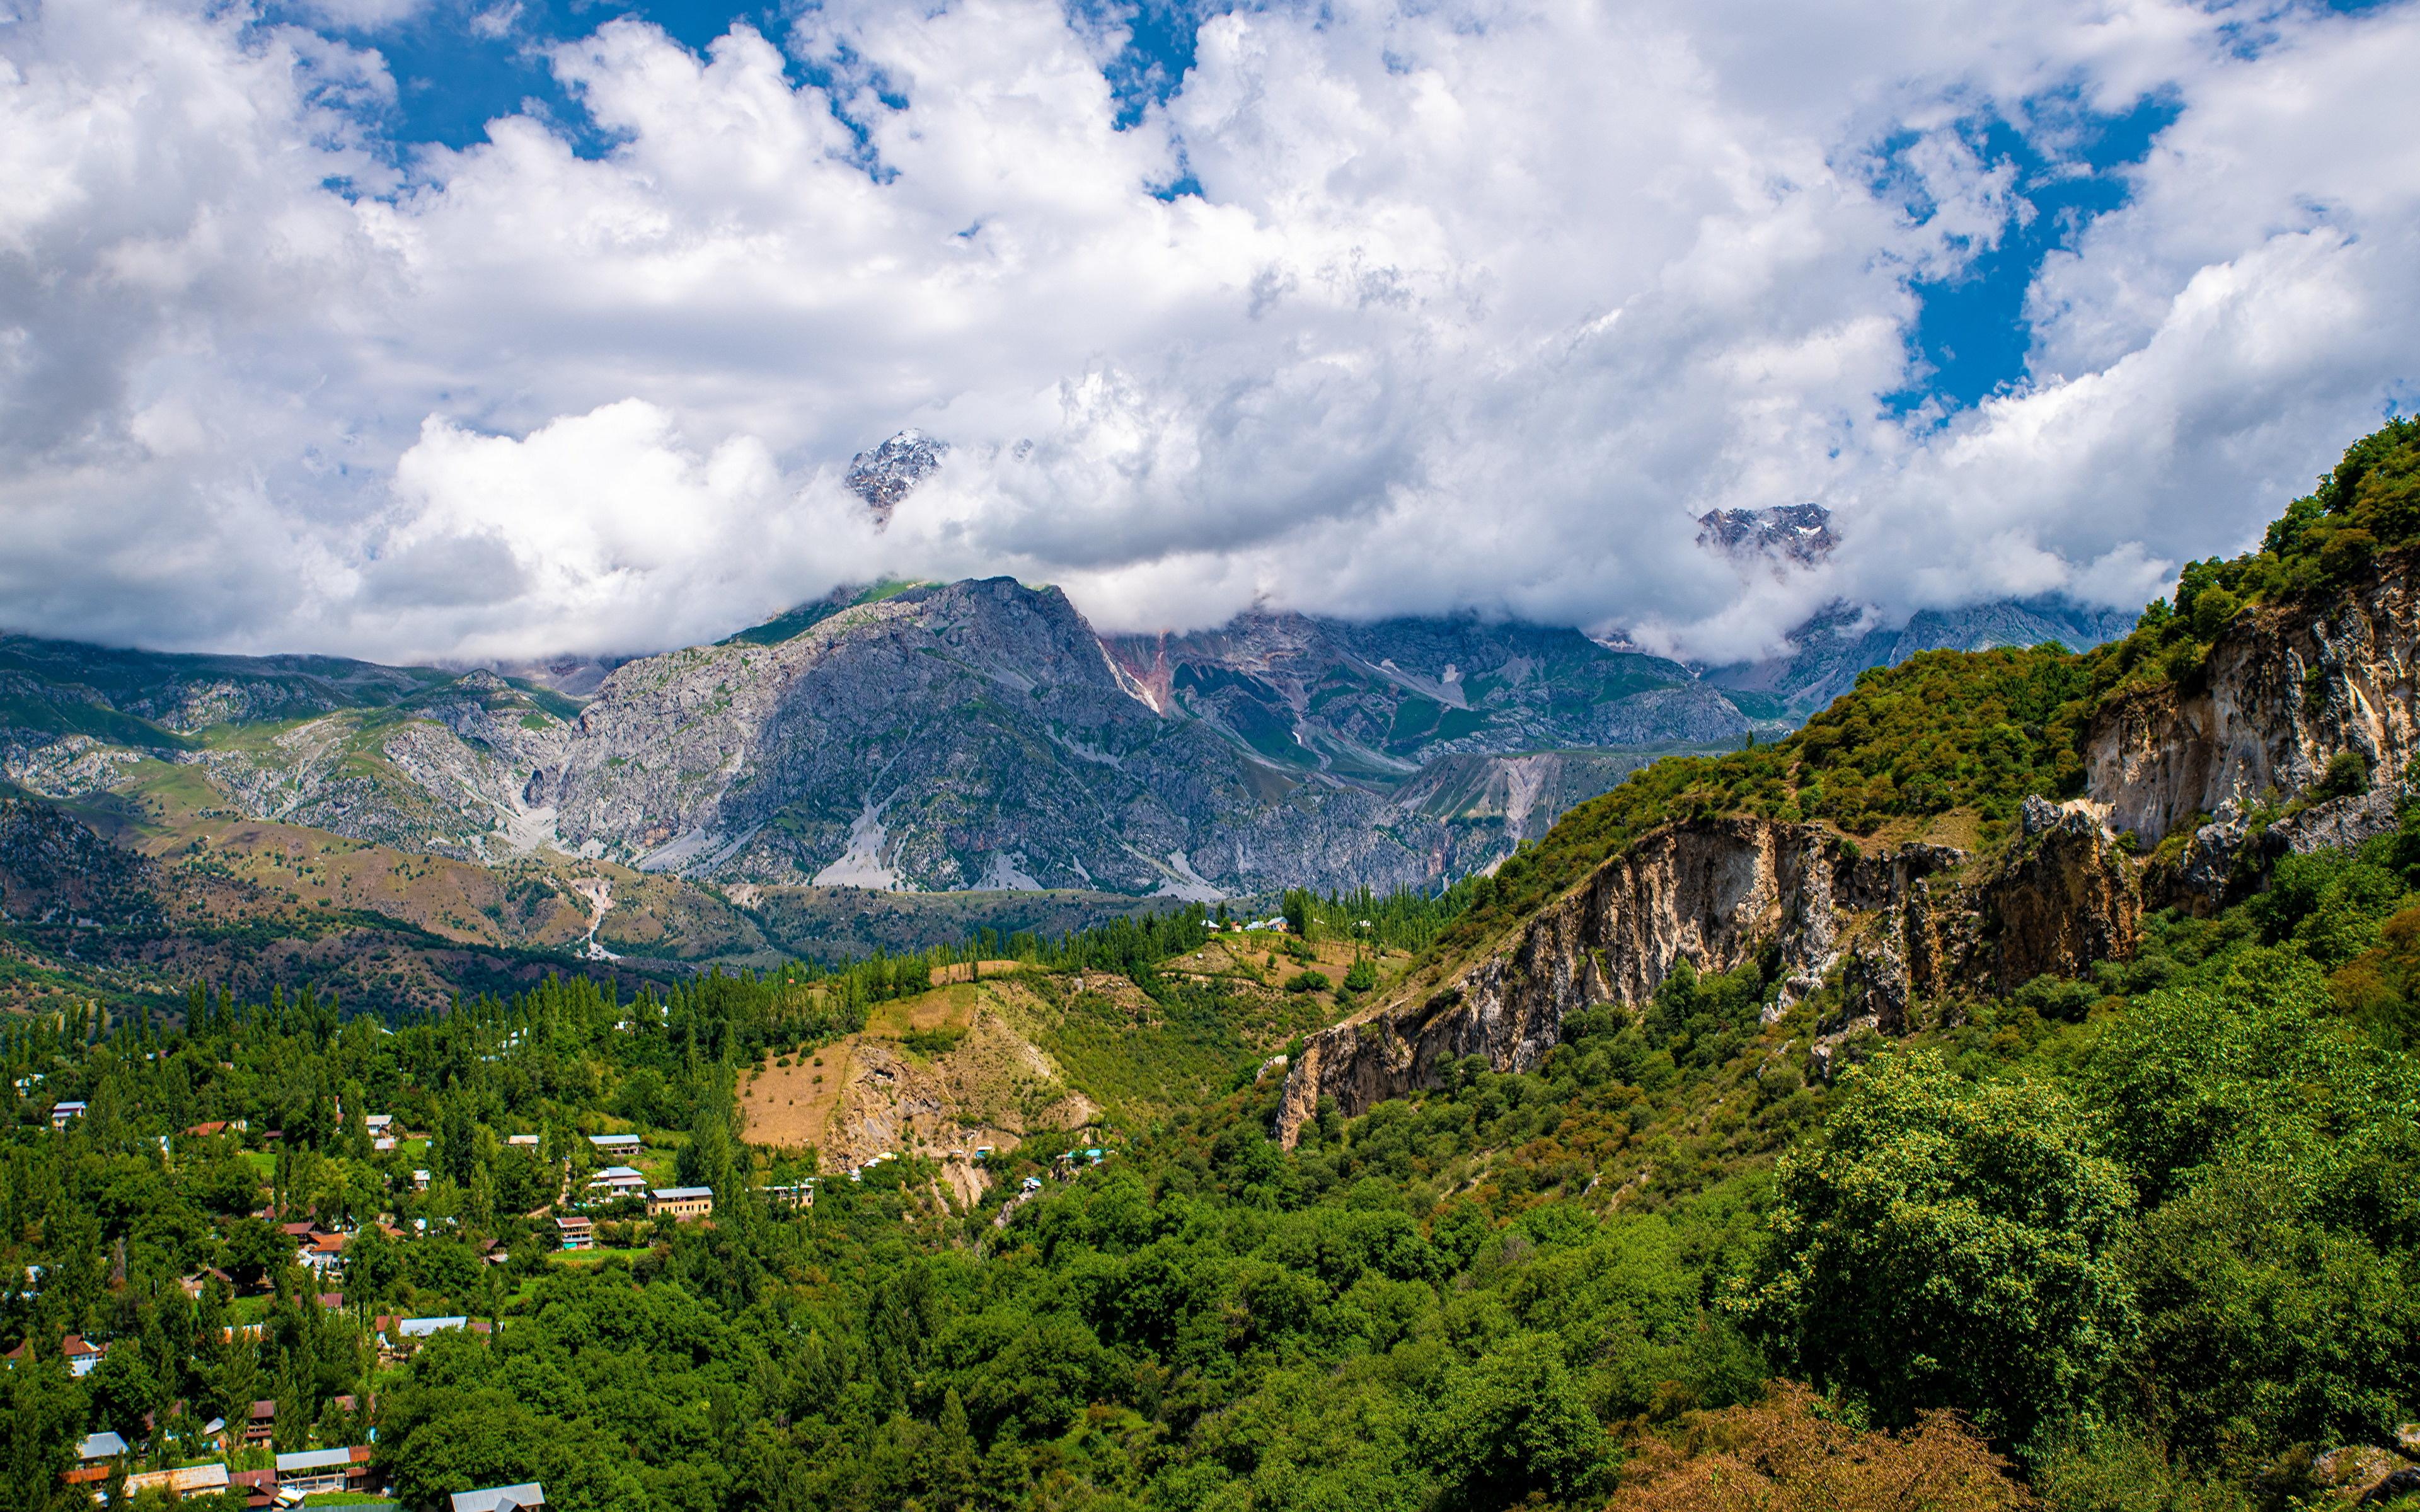 Fotos Arslanbob, Kyrgyzstan Natur Gebirge Wolke 3840x2400 Berg